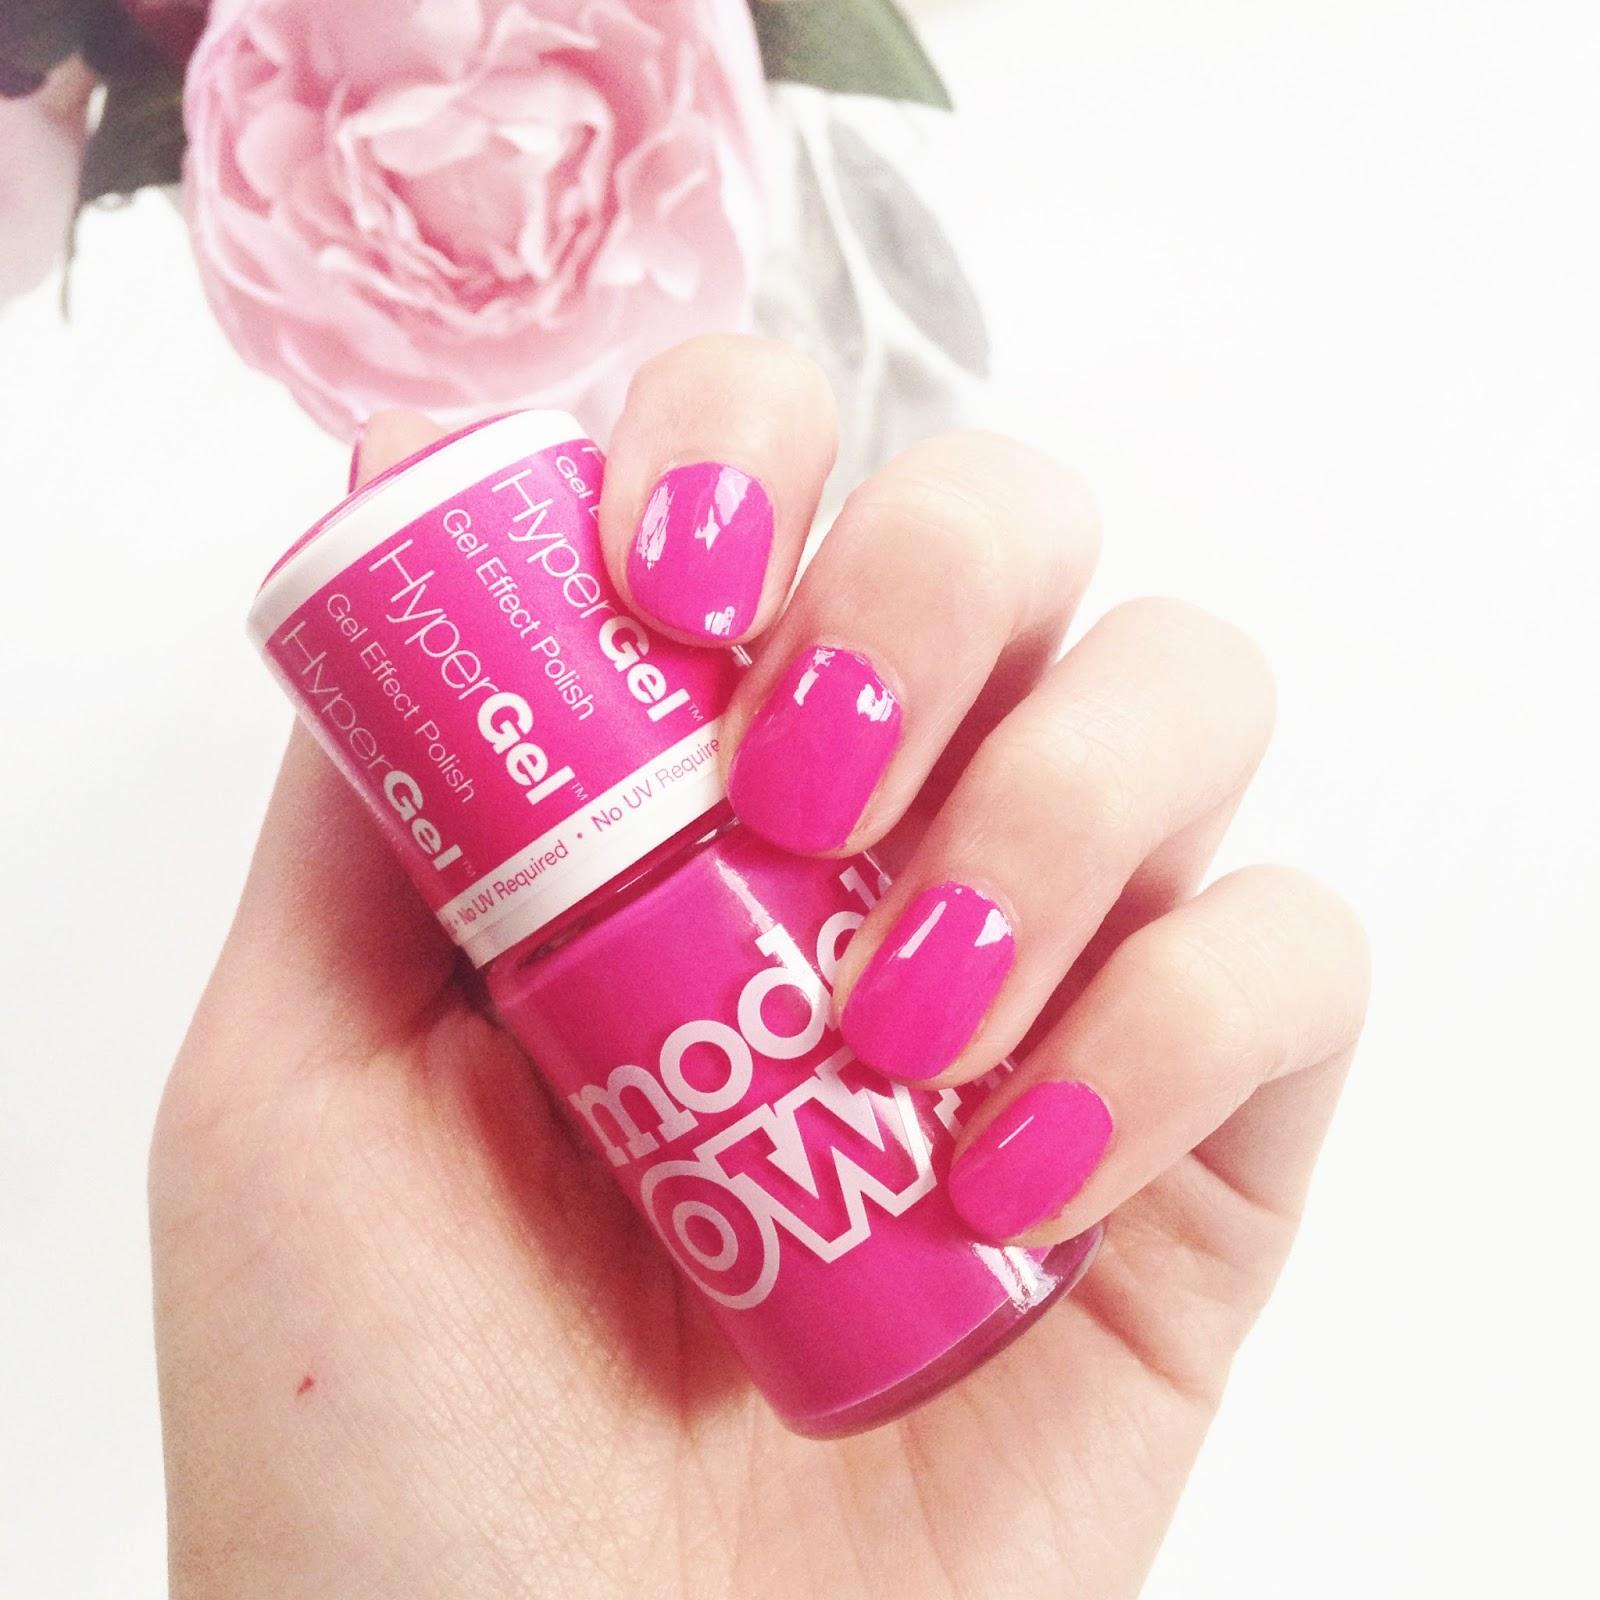 models own hypergel, models own cerise shine, bright pink nail polish, pink gel nail polish, pink nails